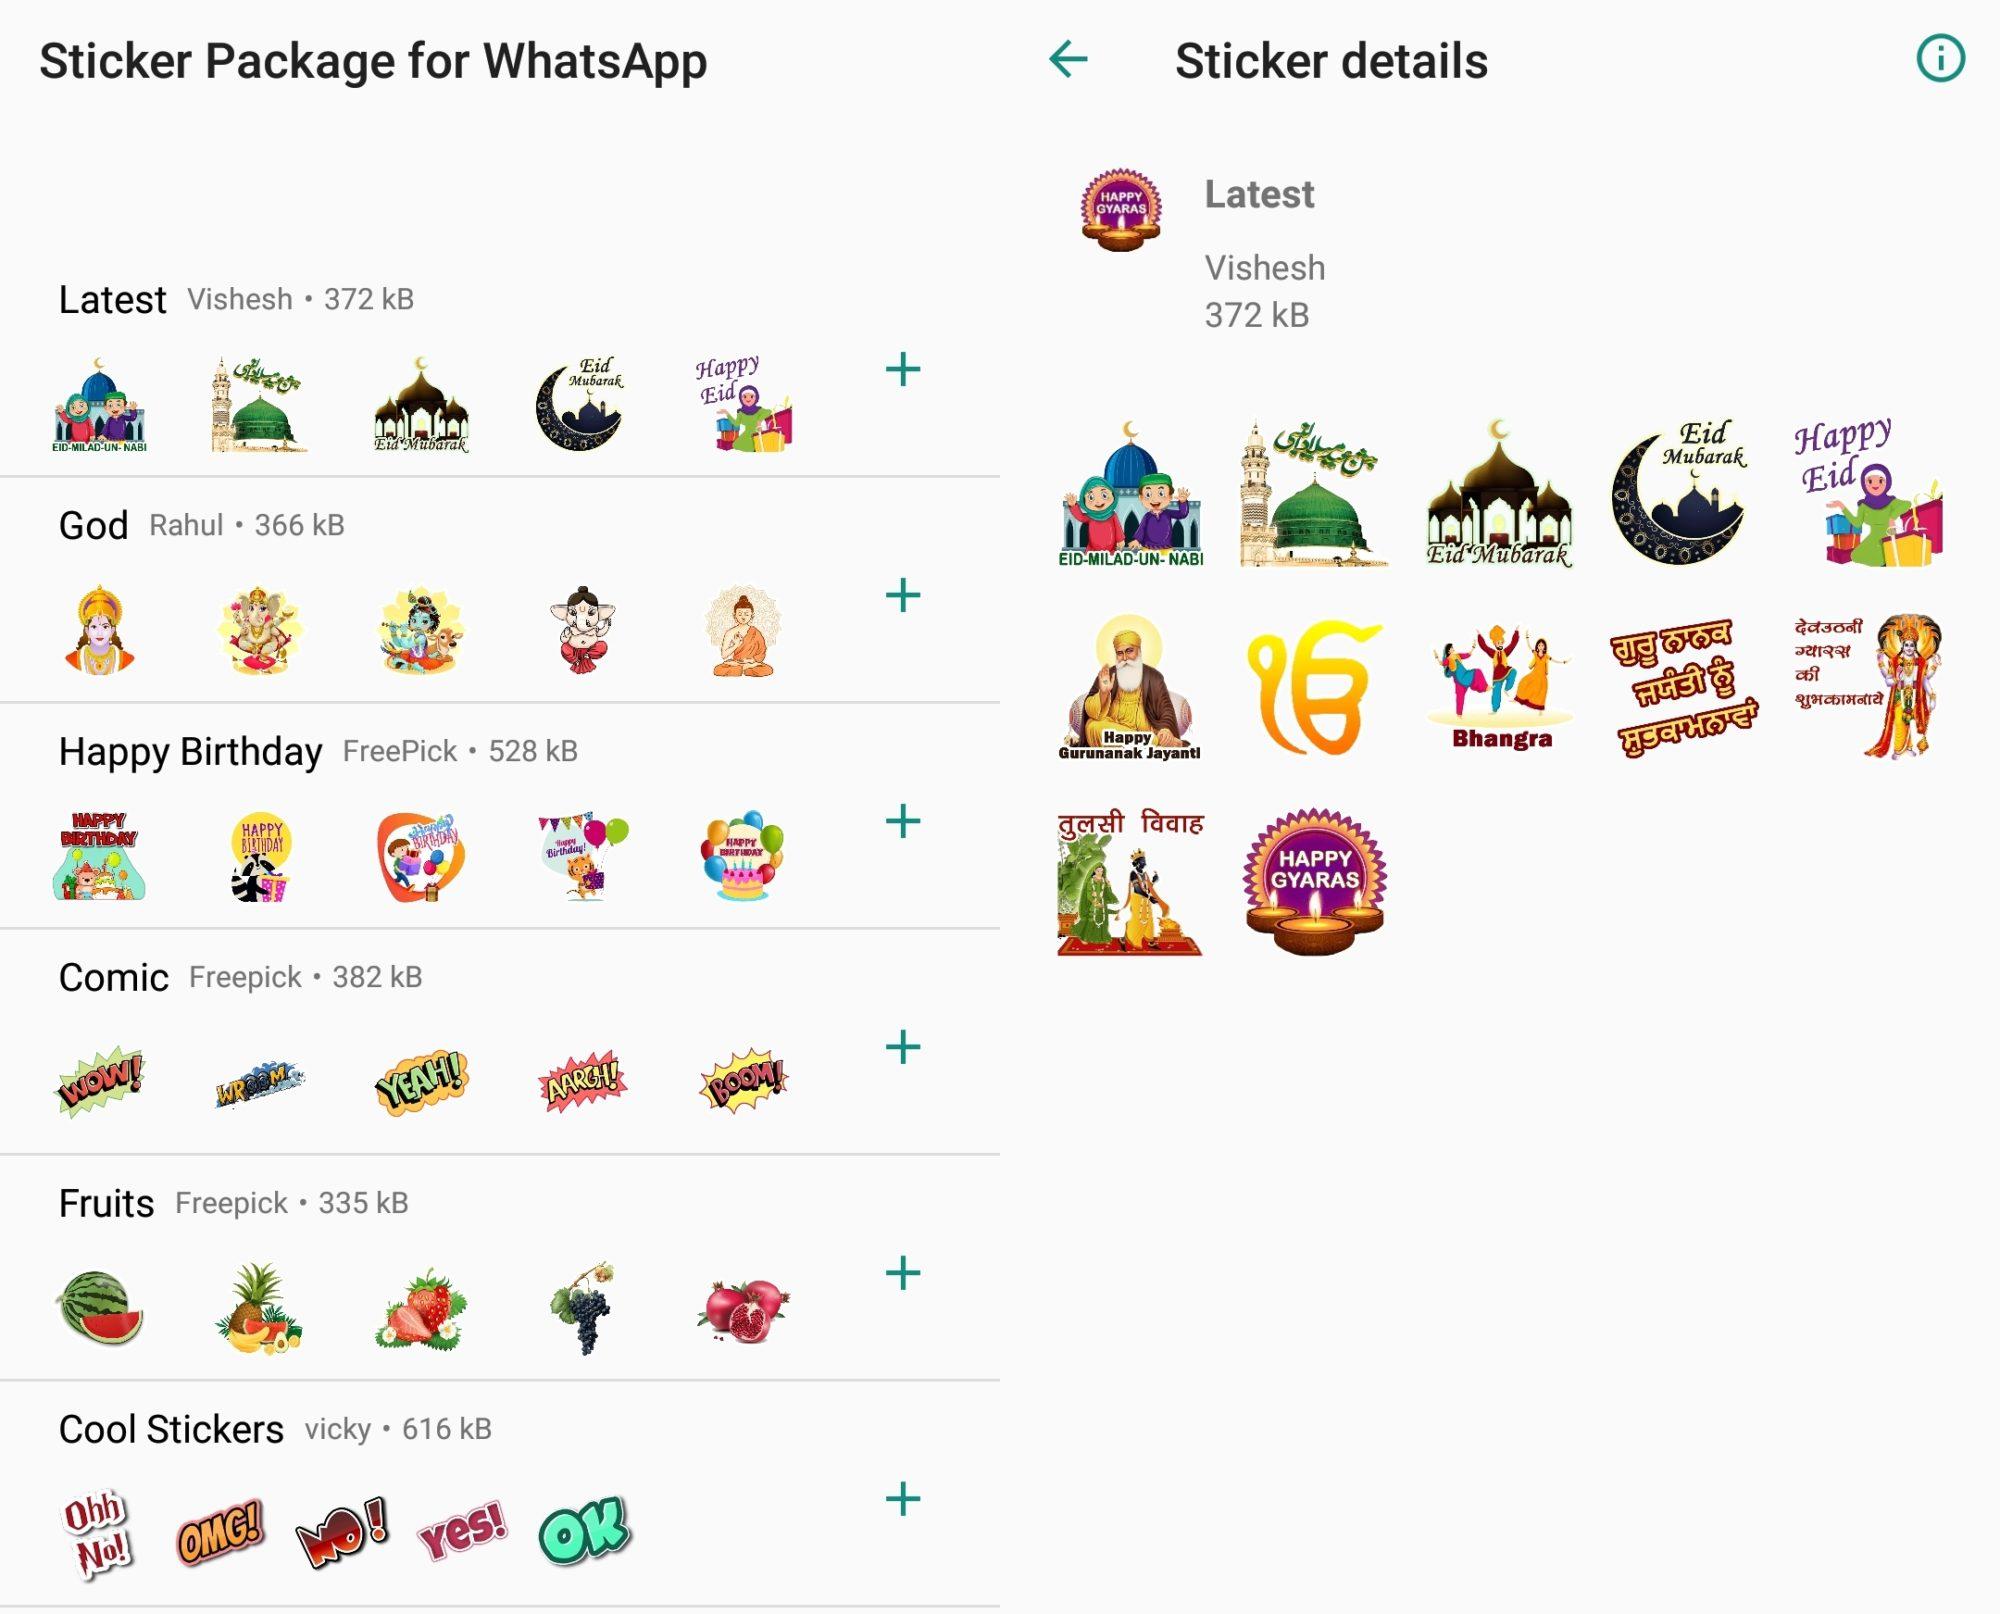 Sticker-Package-WAStickerApps-e1543643829686